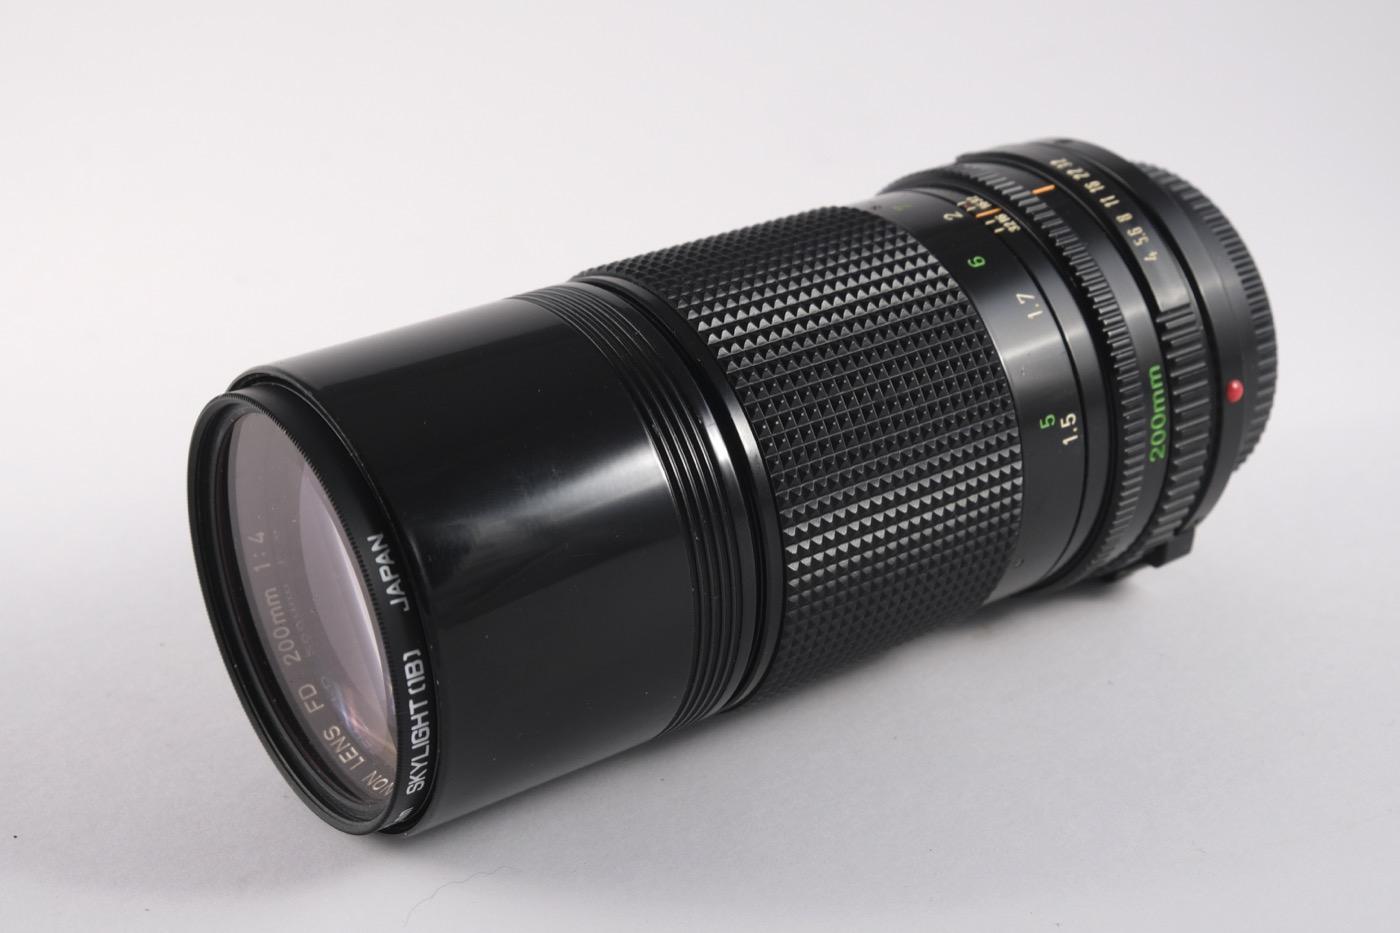 Canon 200mm f/4 lens